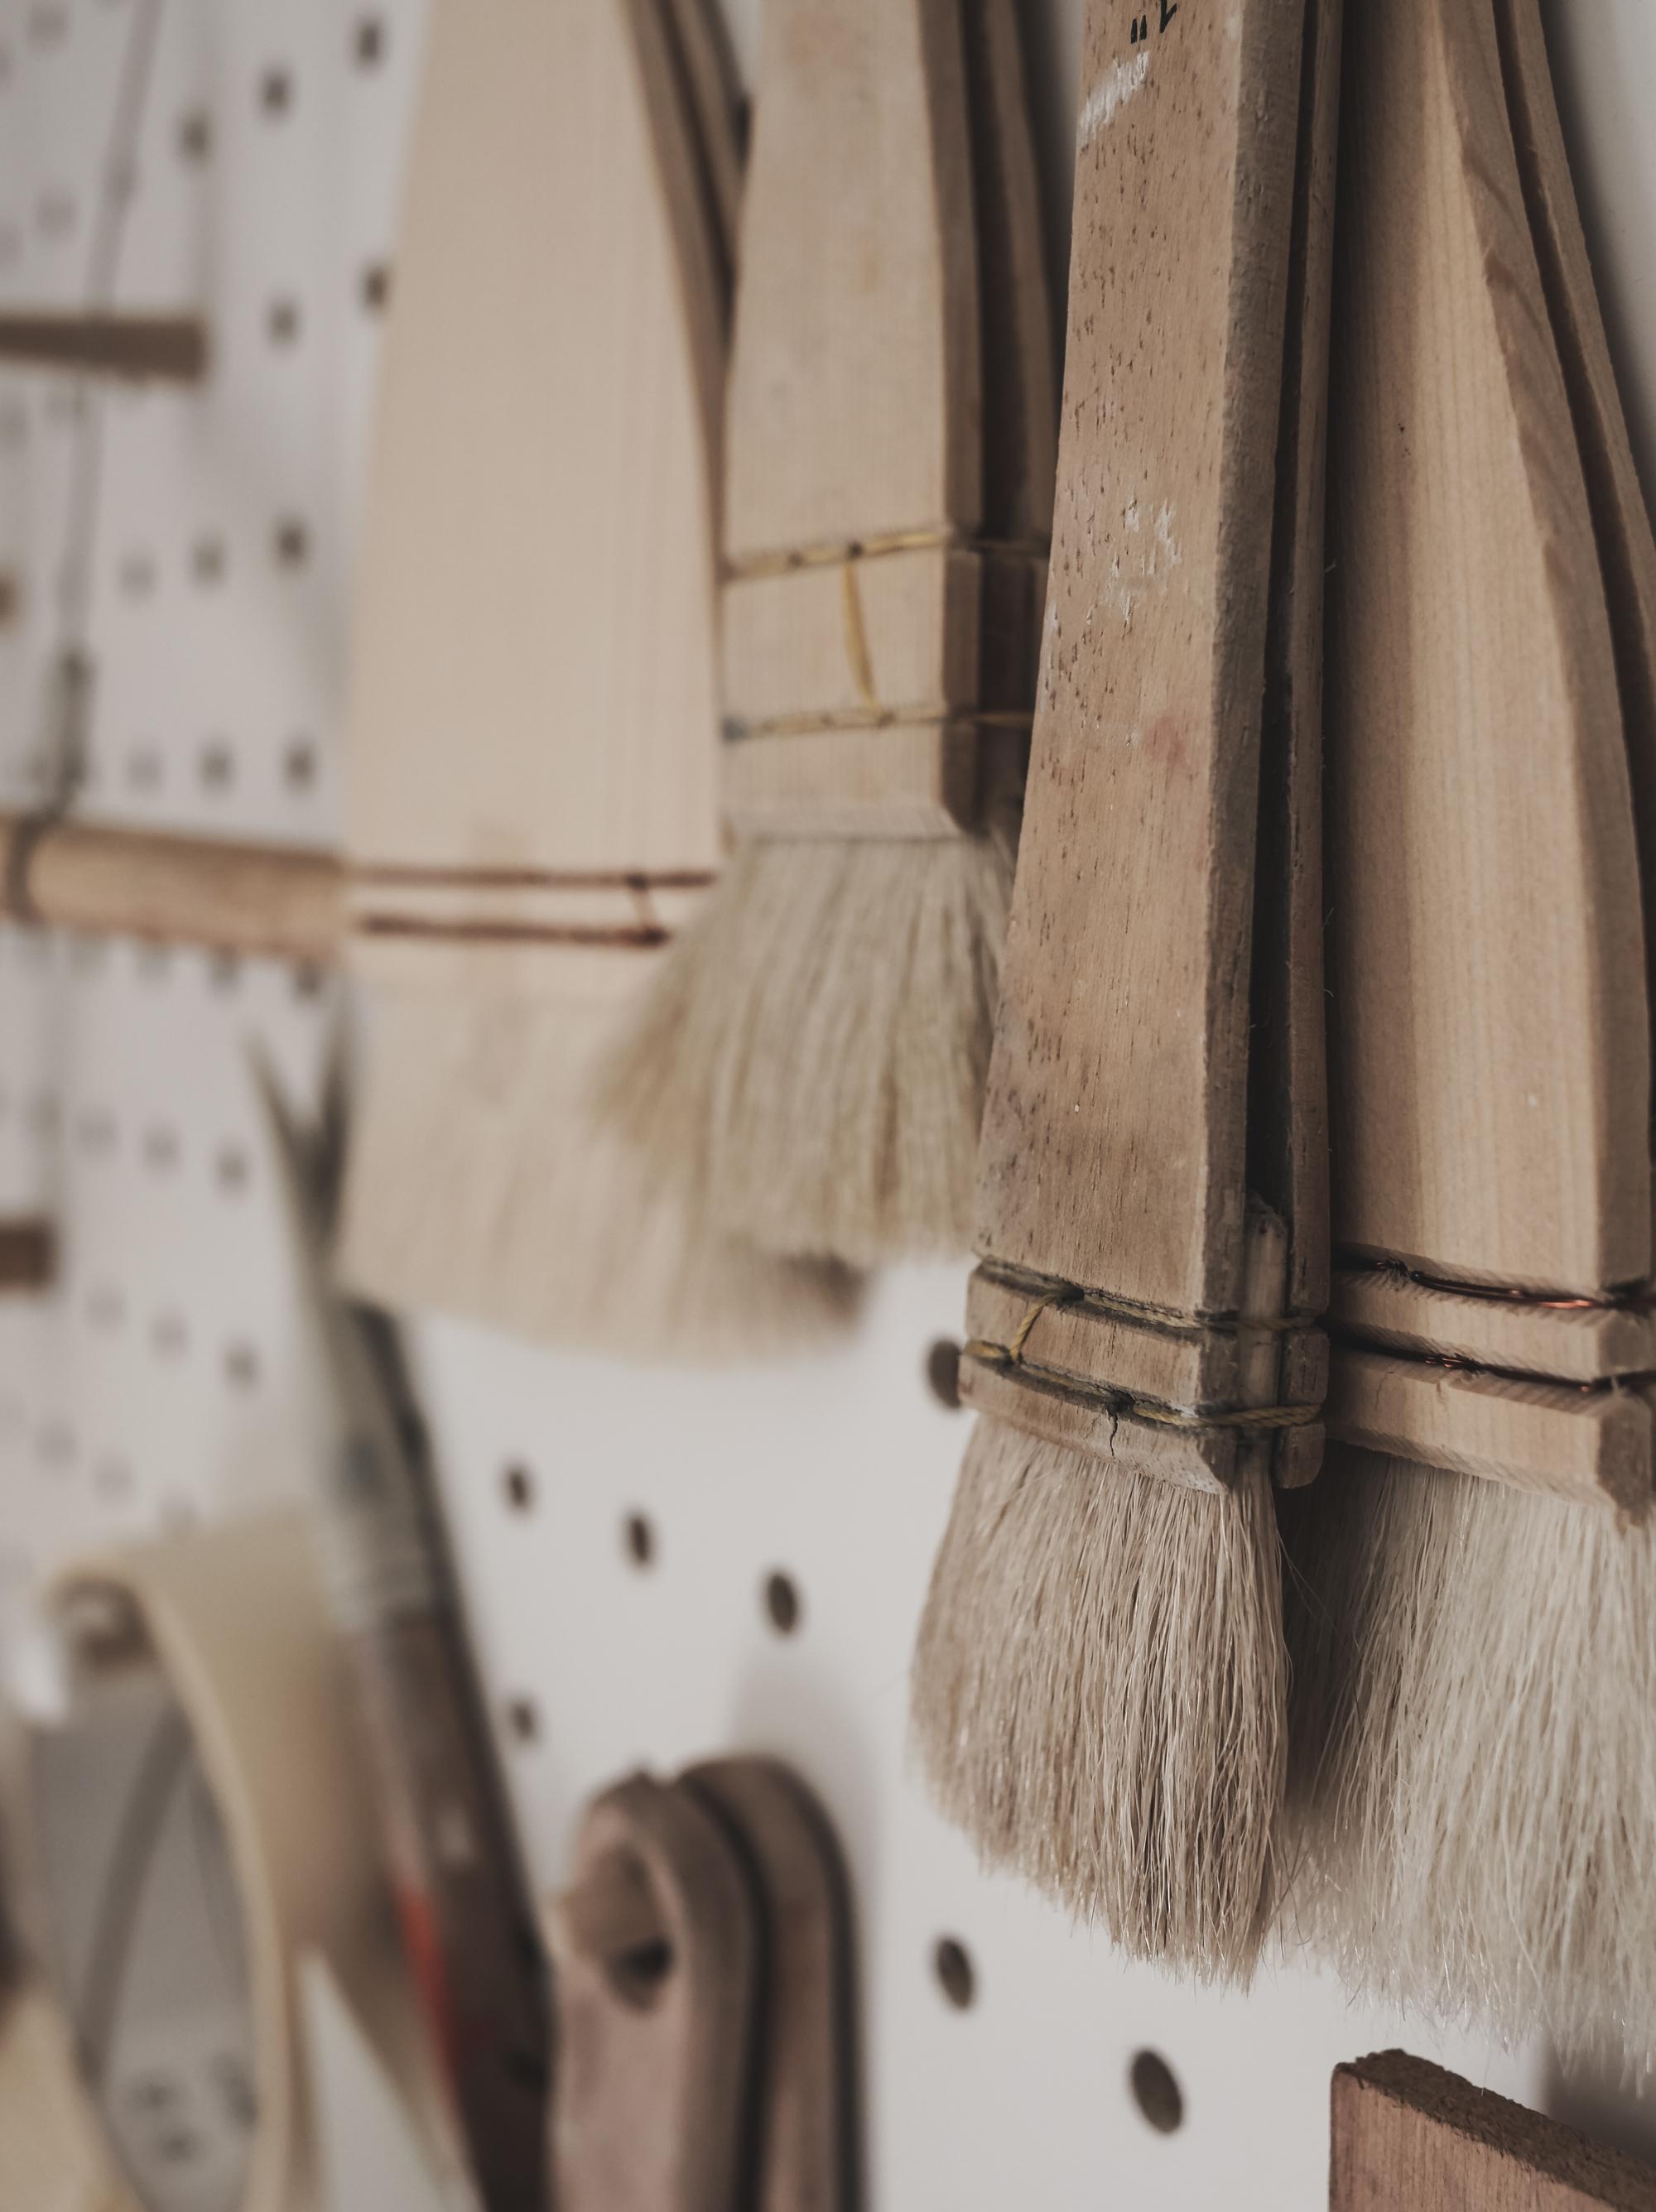 g1_sanna_glaze_brushes.jpg